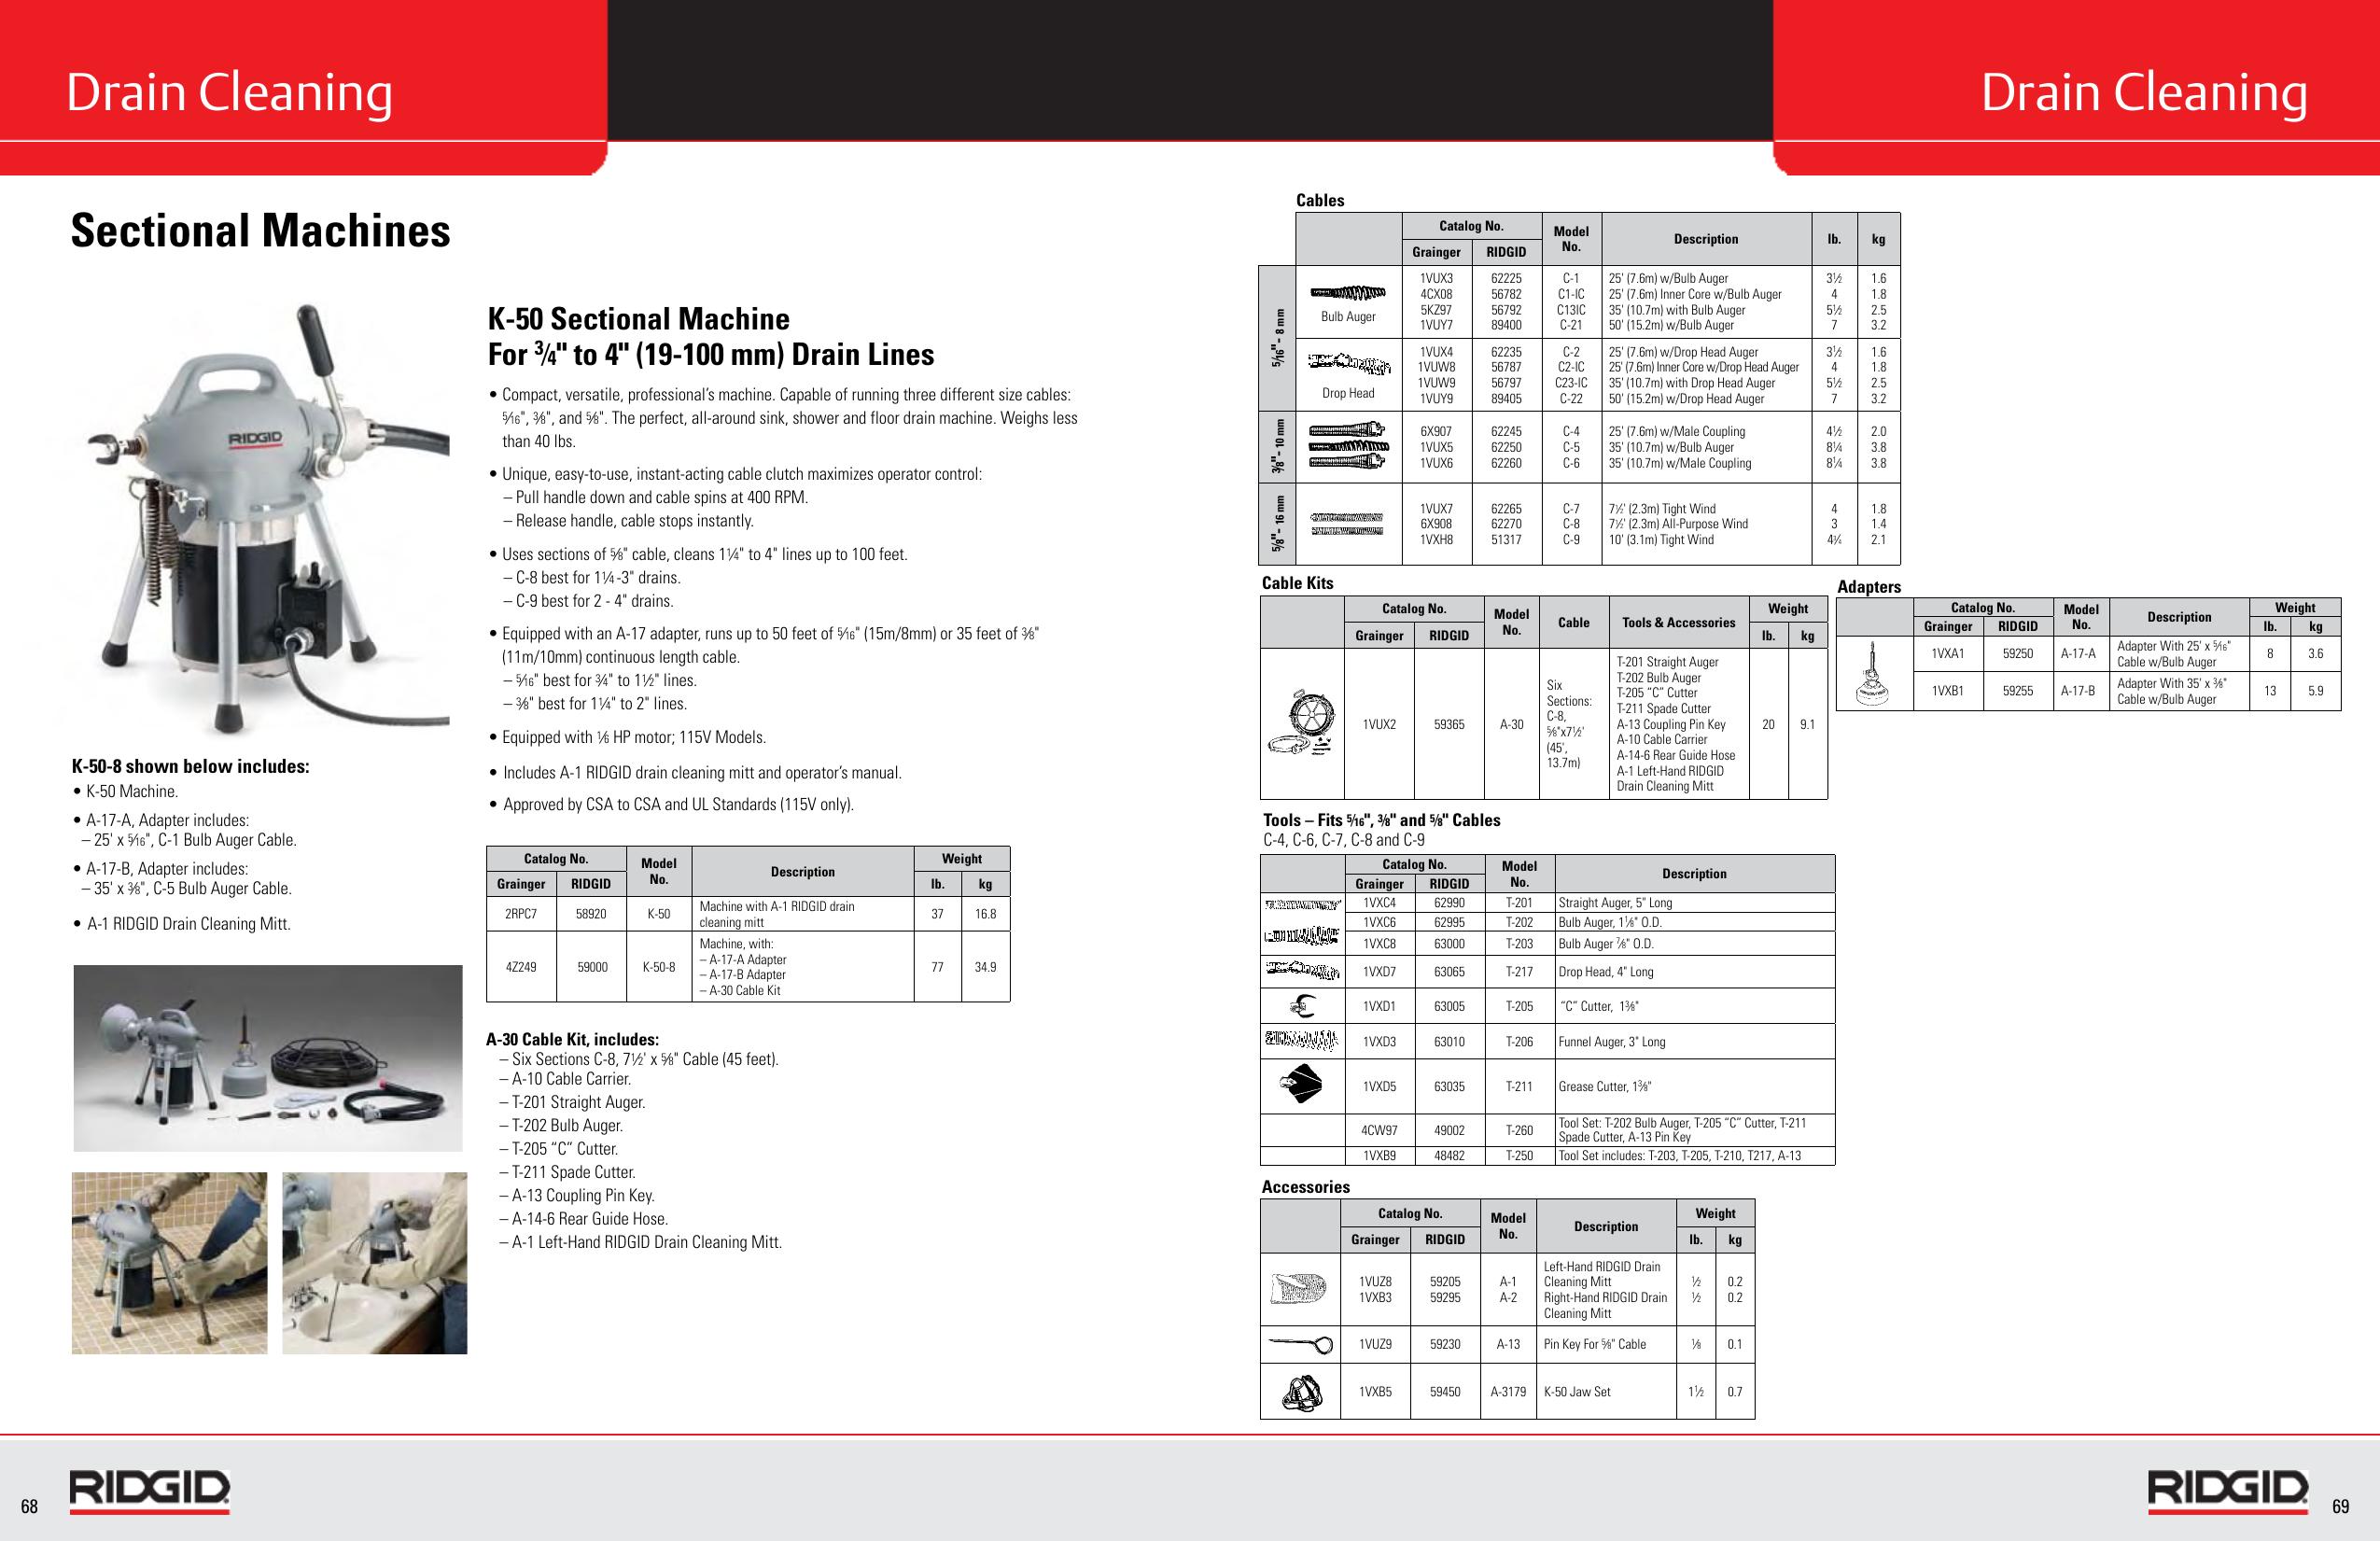 Ridgid Product Catalog 104411